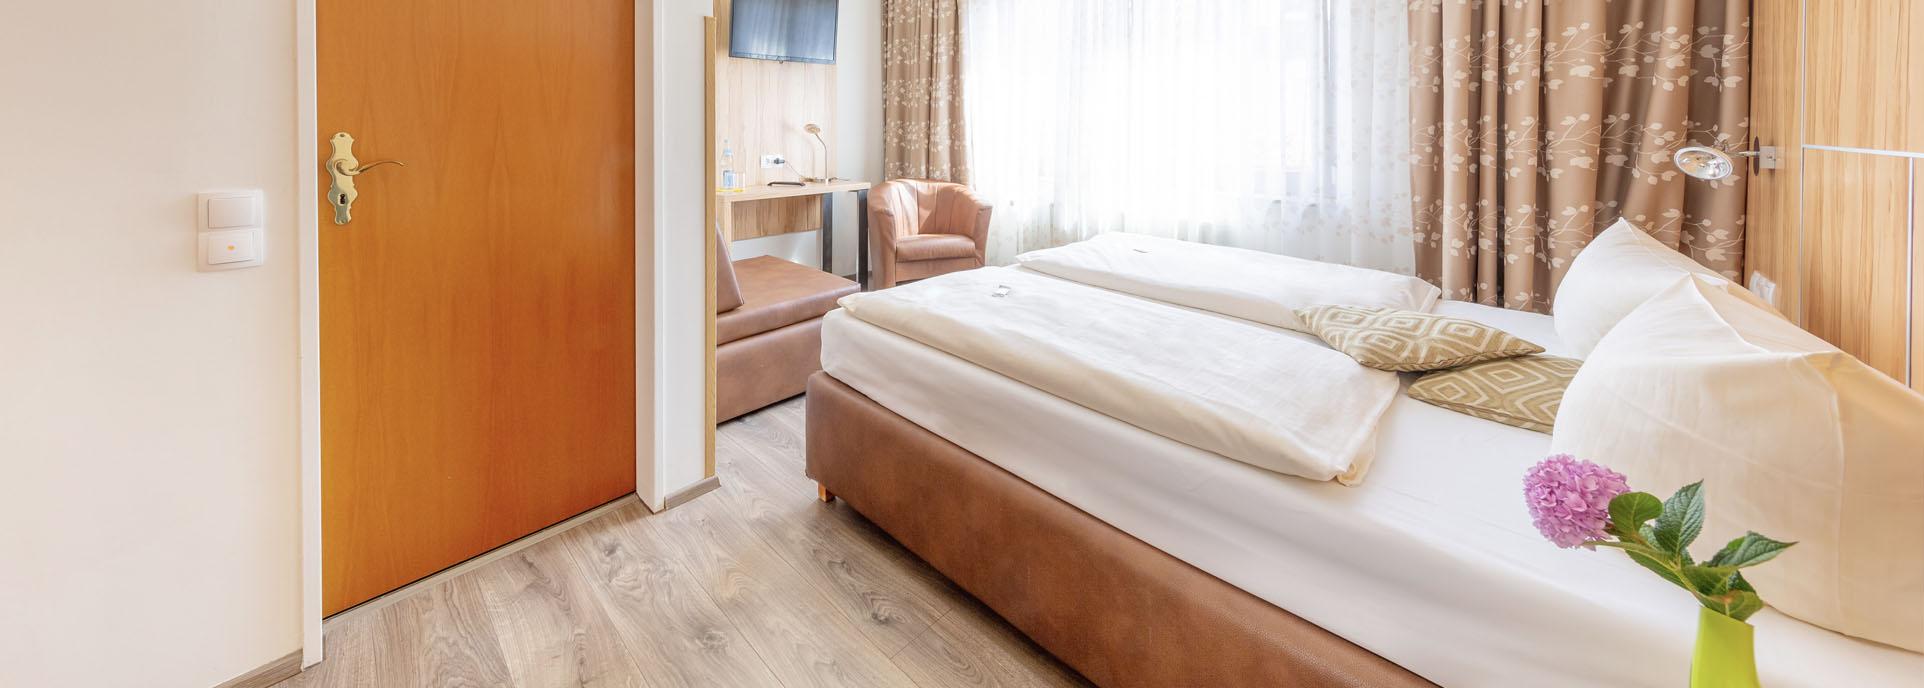 hotel_reinhardtshof_slide_04